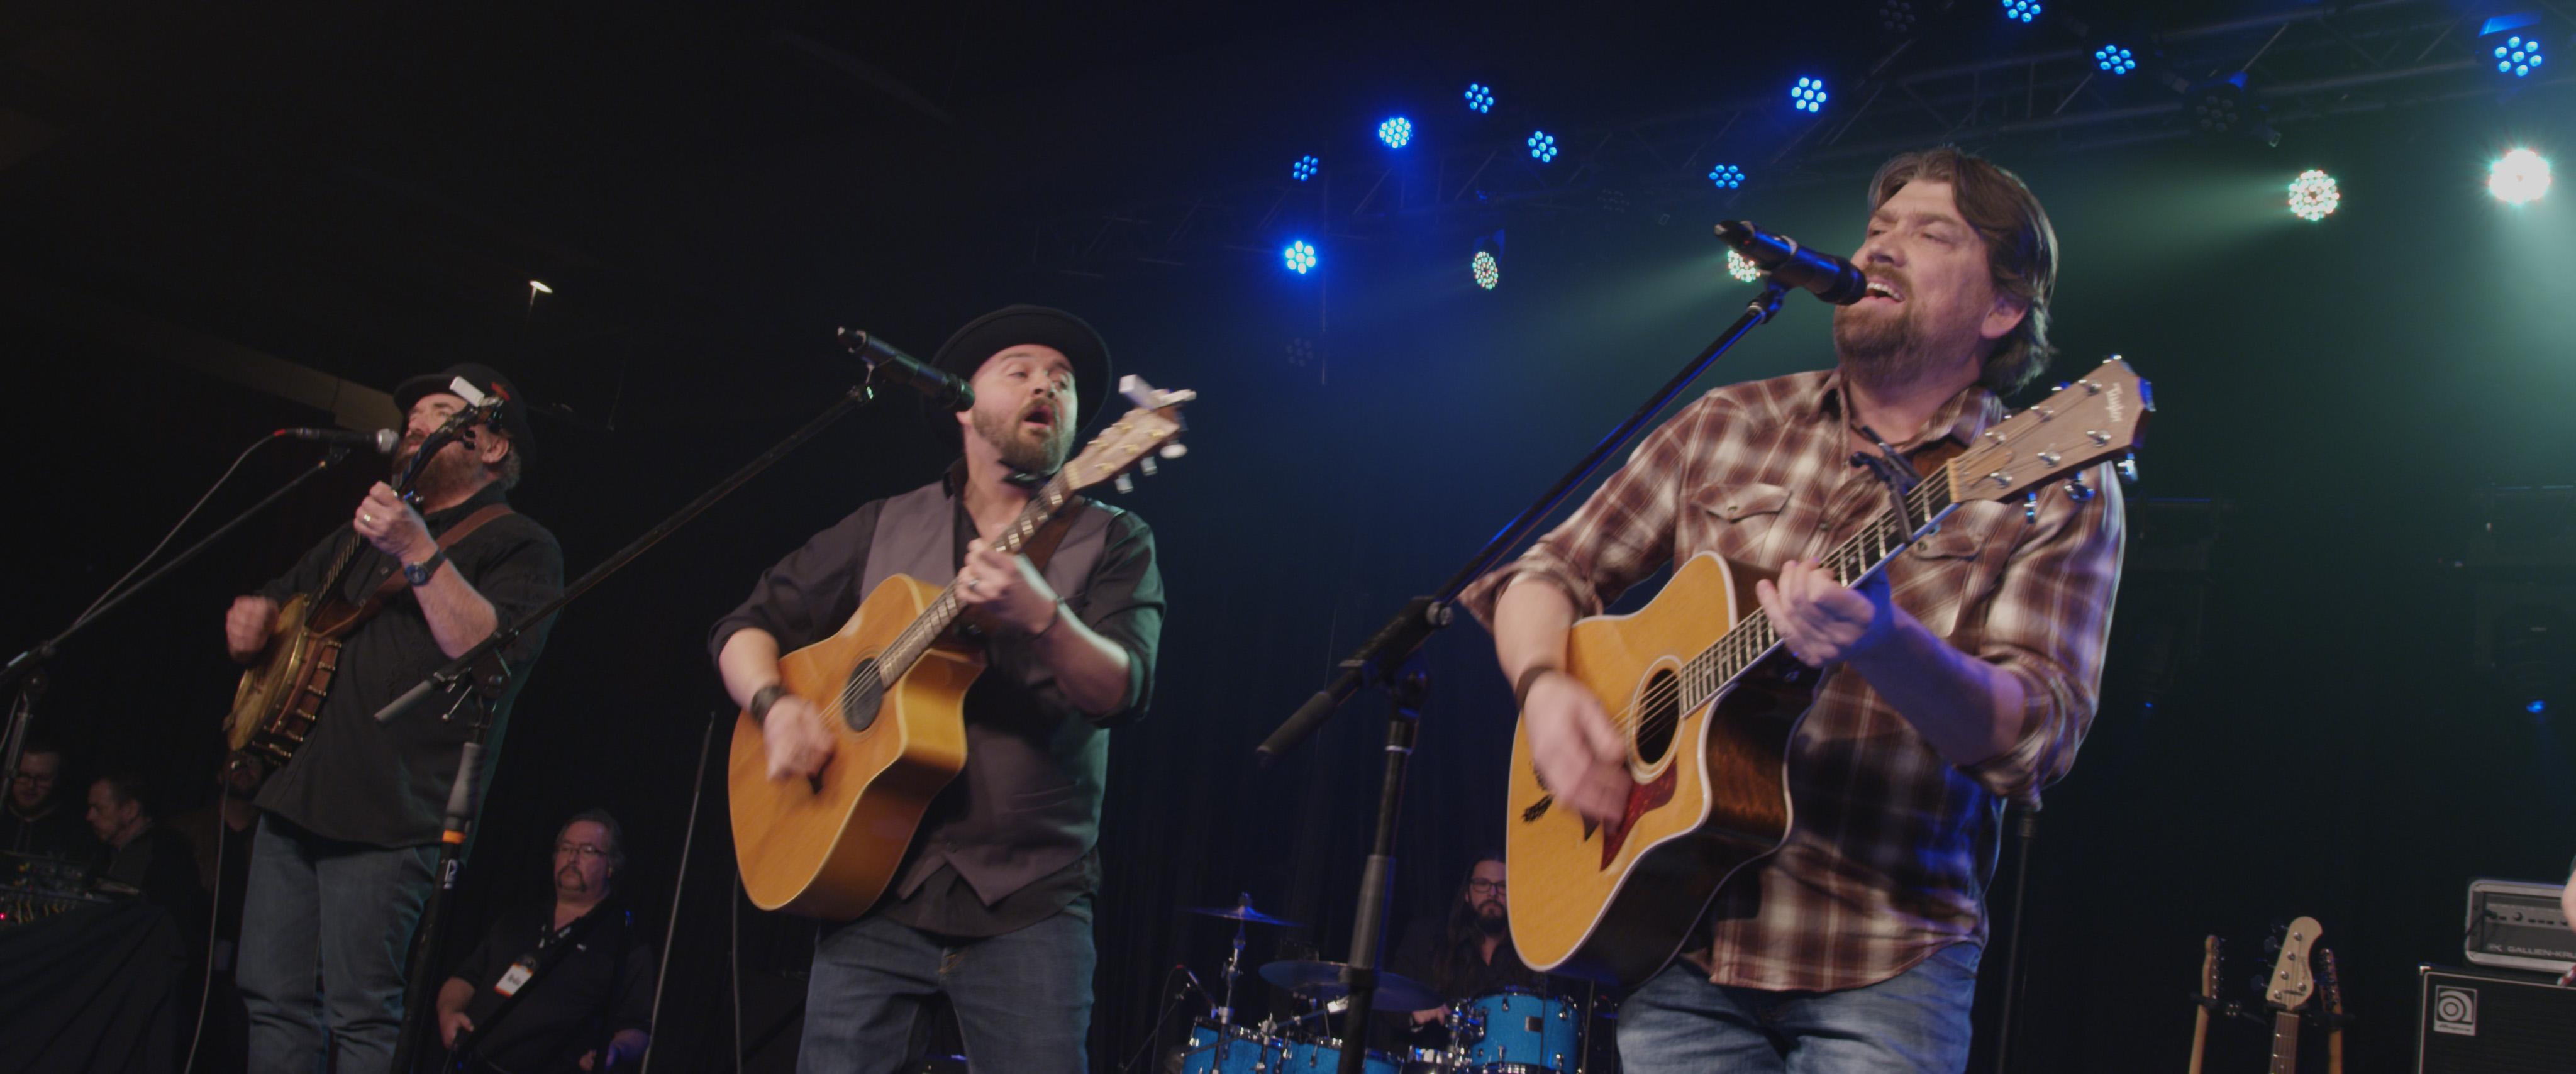 Blake Reid Band - 2017 ACMA's 05